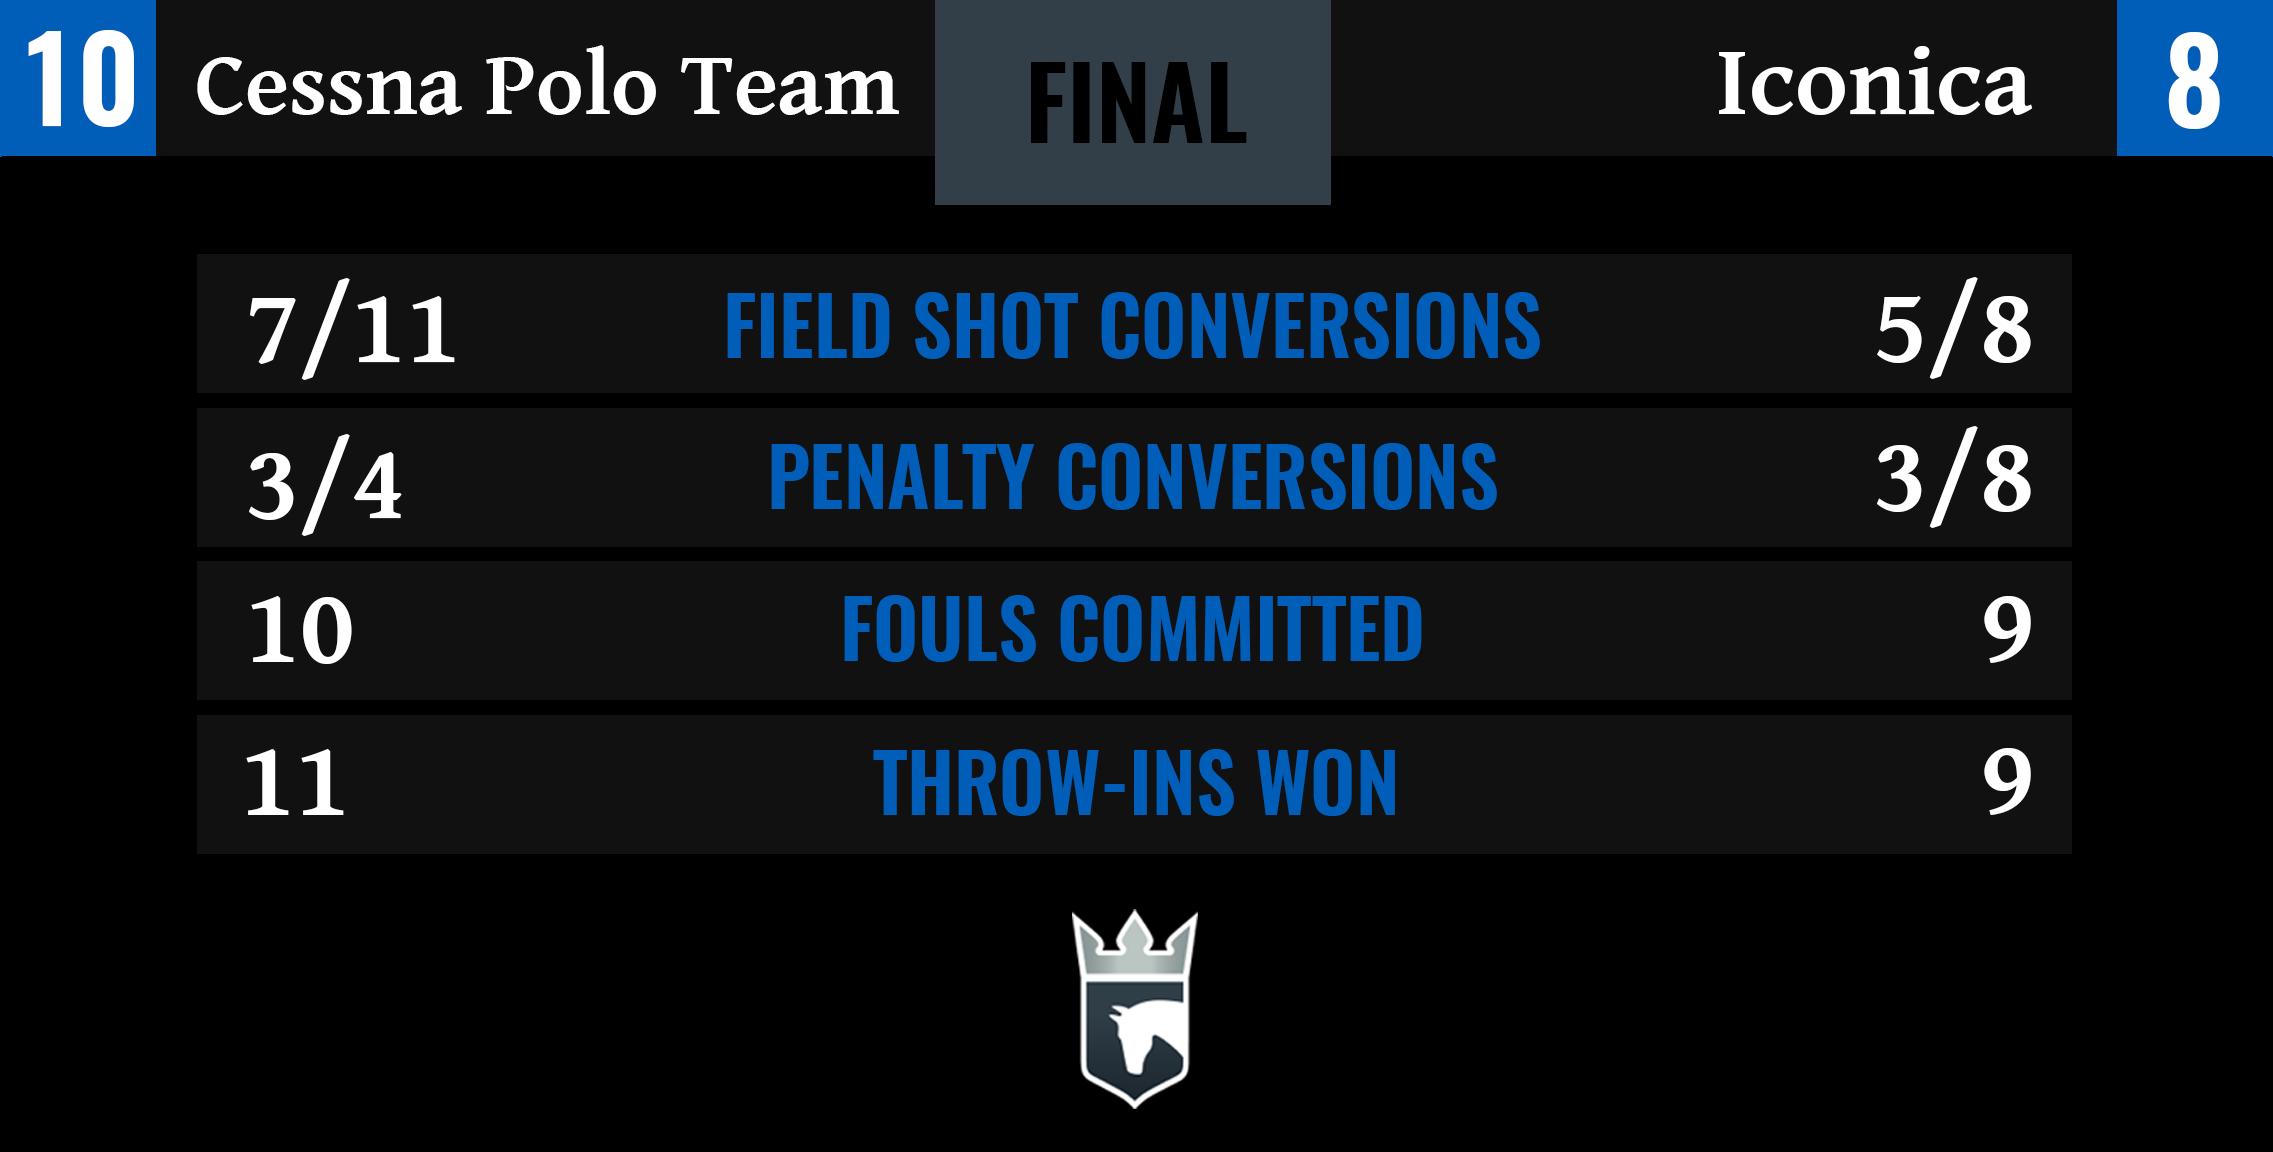 Cessna Polo Team vs Iconica Final Stats